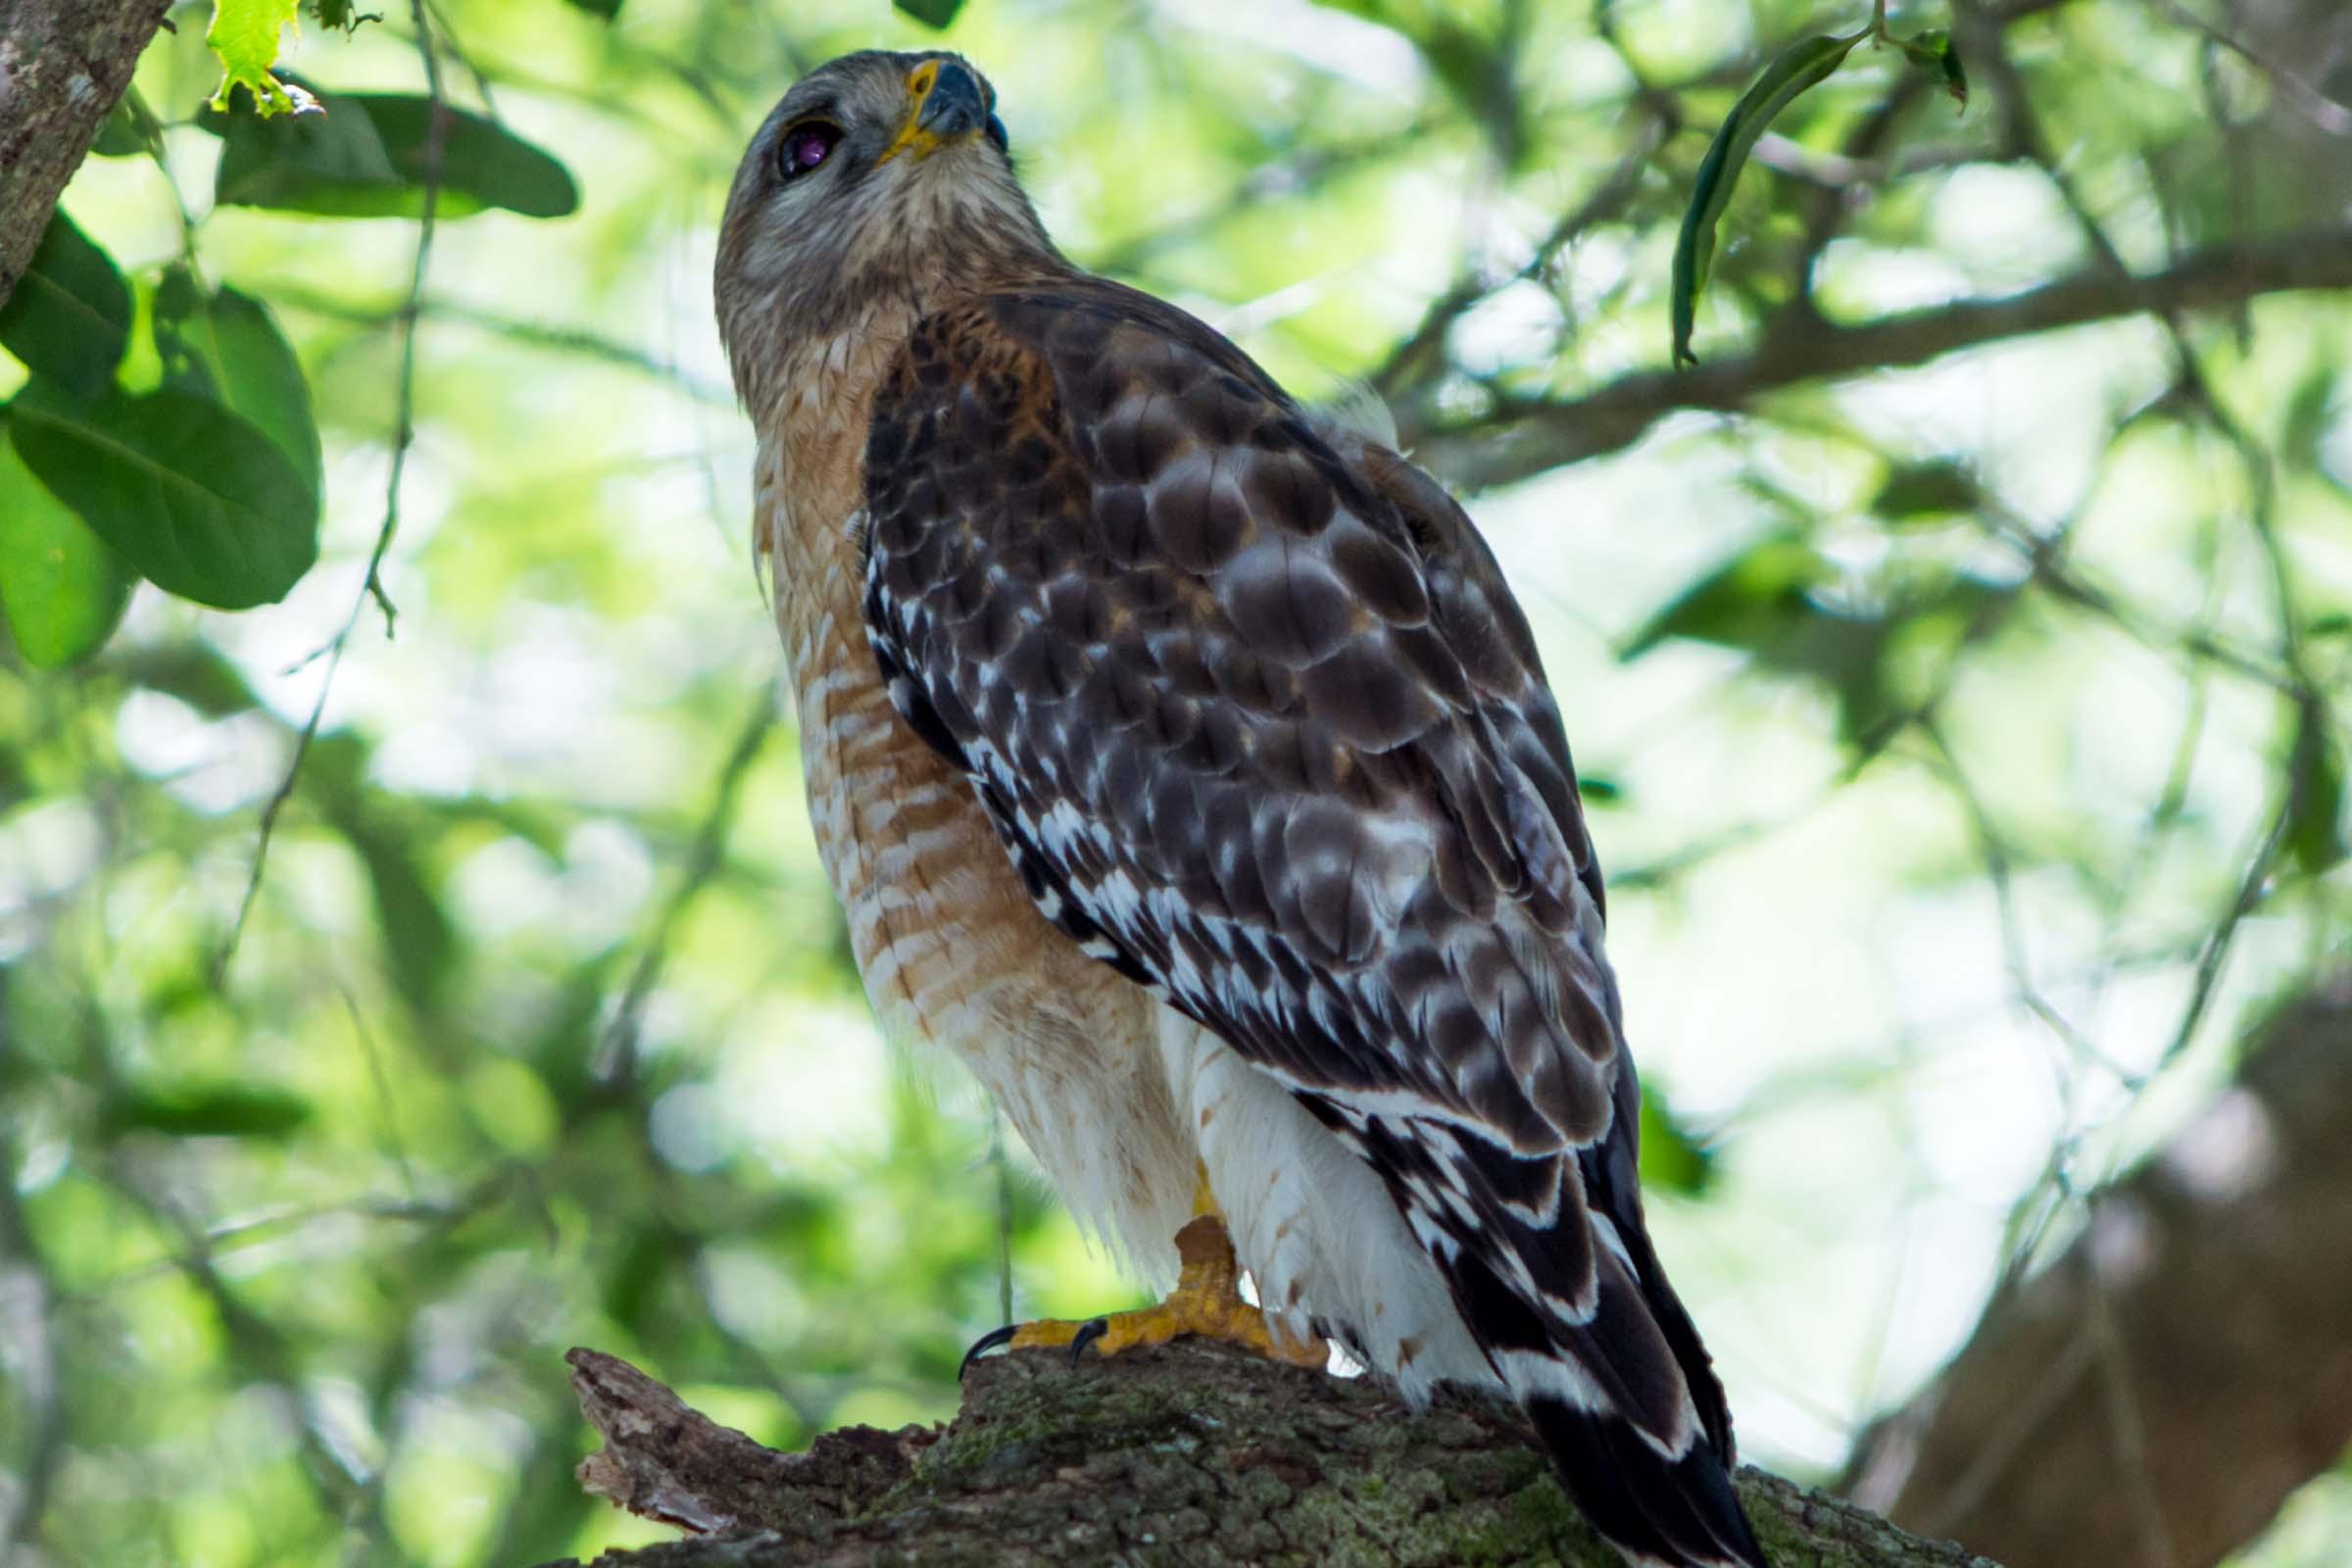 Brown hawk sitting on a tree branch